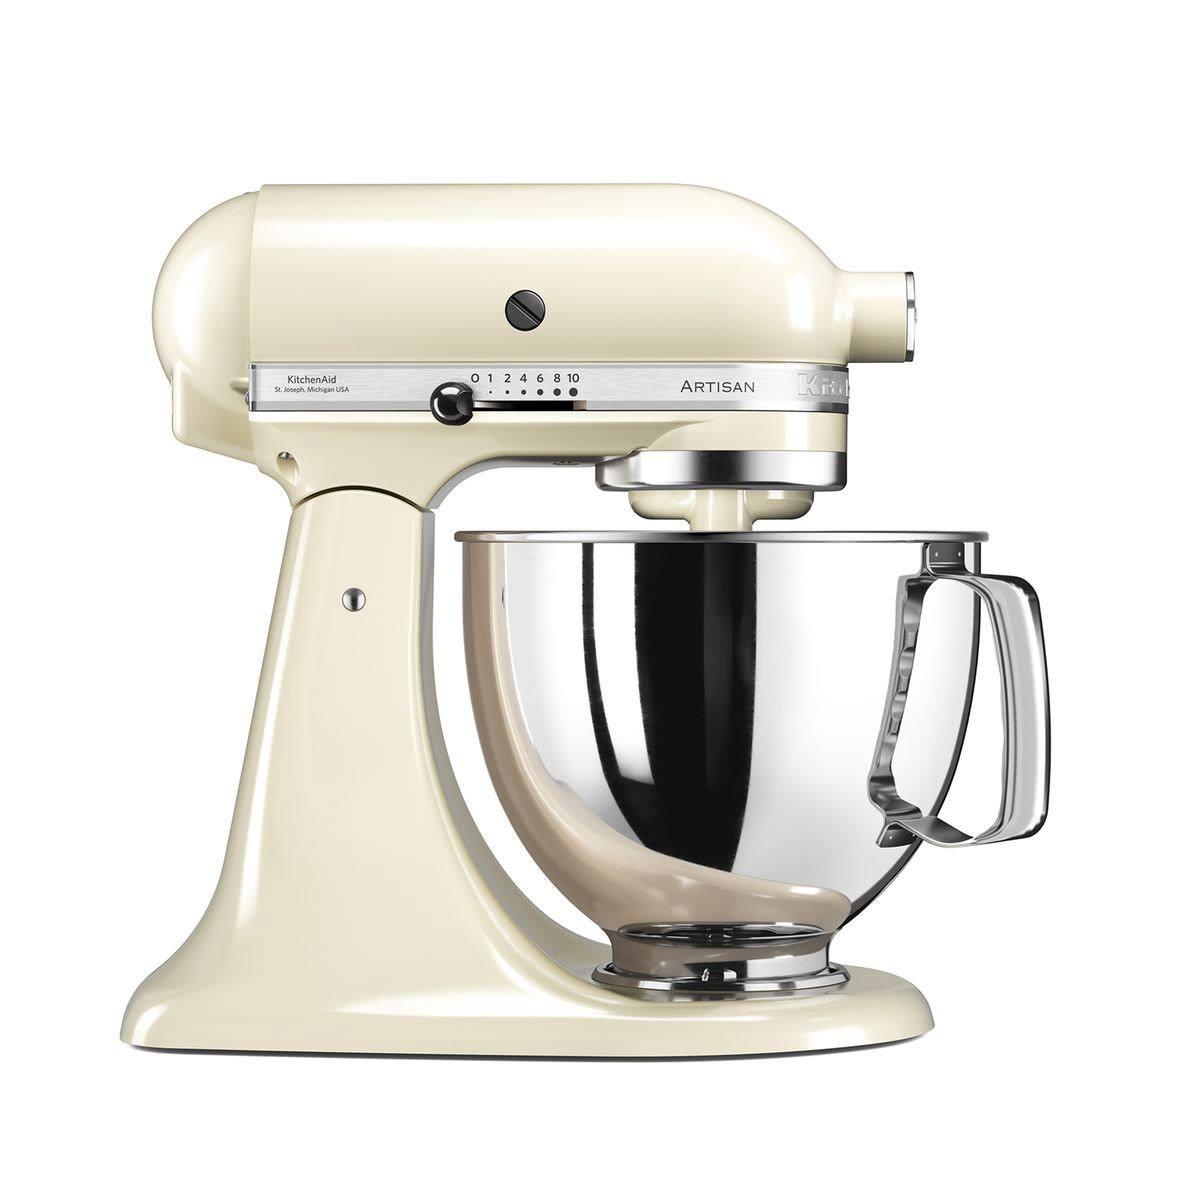 Blog-Mode-And-The-City-Lifestyle-Cinq-Petites-Choses-219-robot-patissier-kitchen-aid-la-redoute